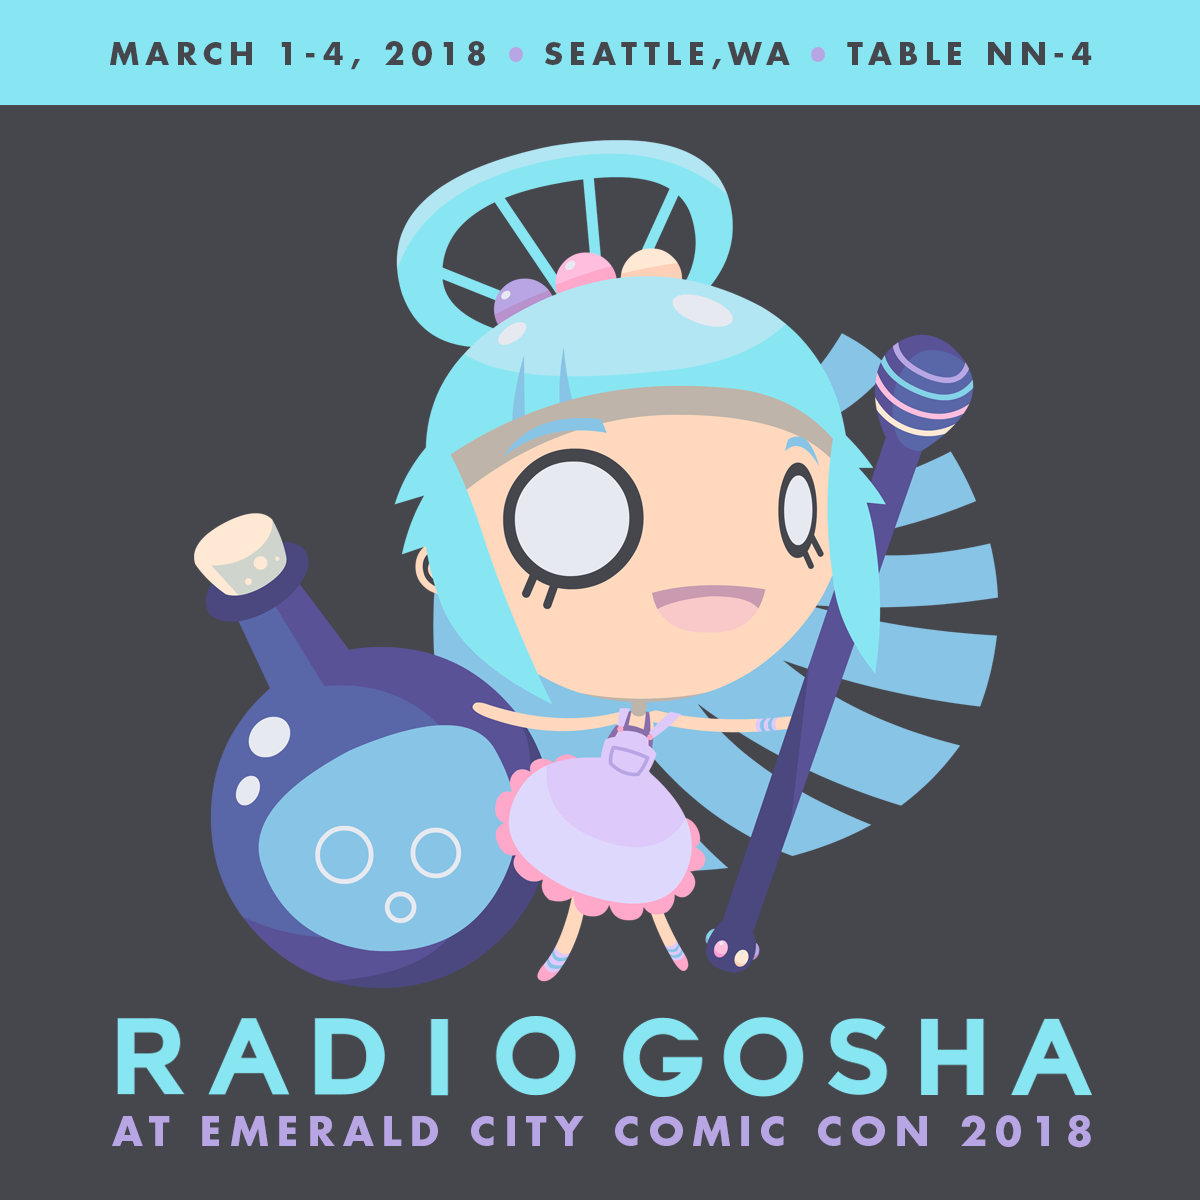 Radio Gosha x Emerald City Comic Con 2018 by GoshaDole